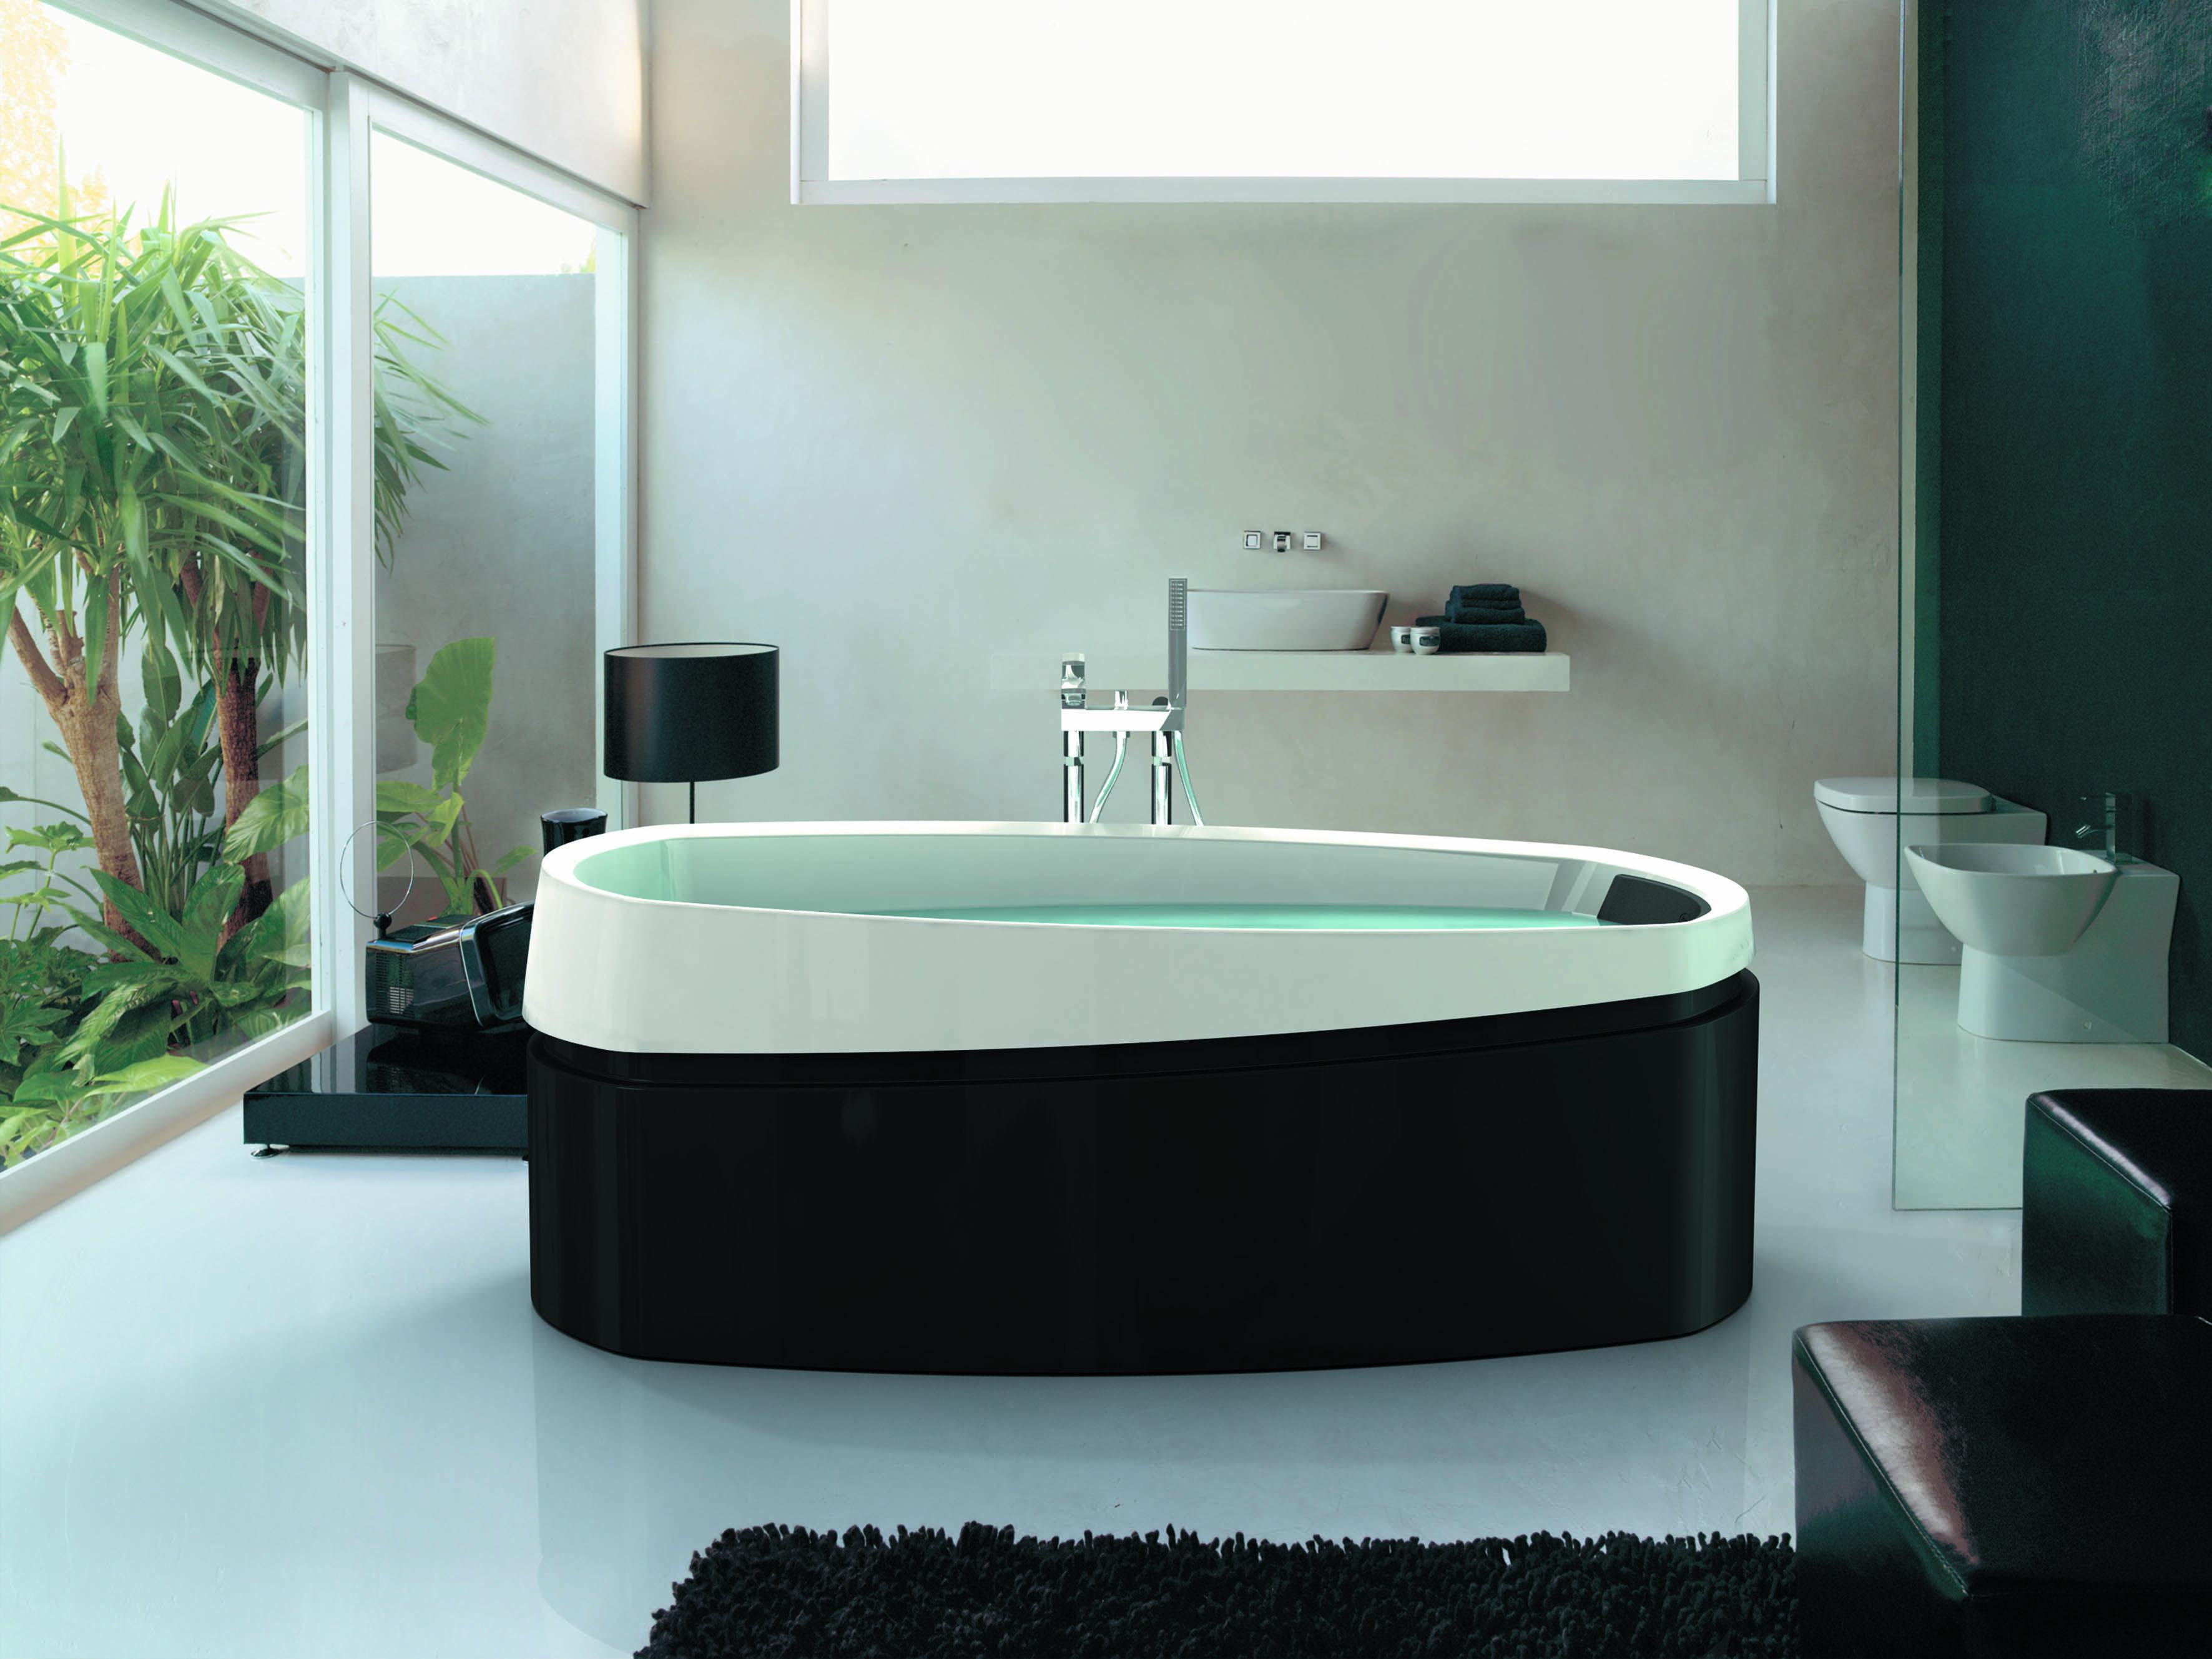 Bathroom With Jacuzzi 27 Images Photos Jacuzzi Elegant Bathroom